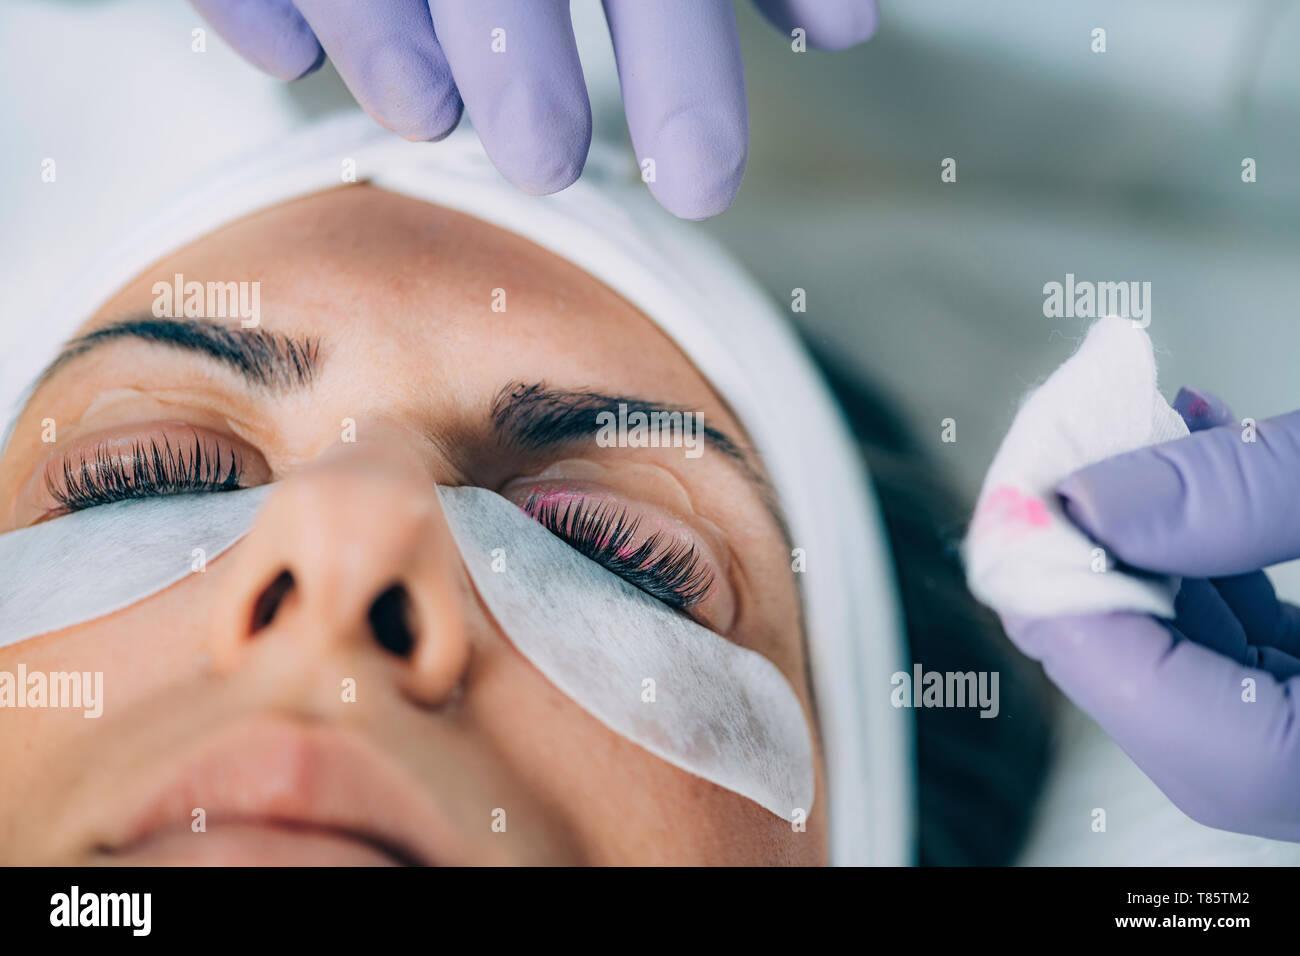 Keratin lash lift procedure - Stock Image